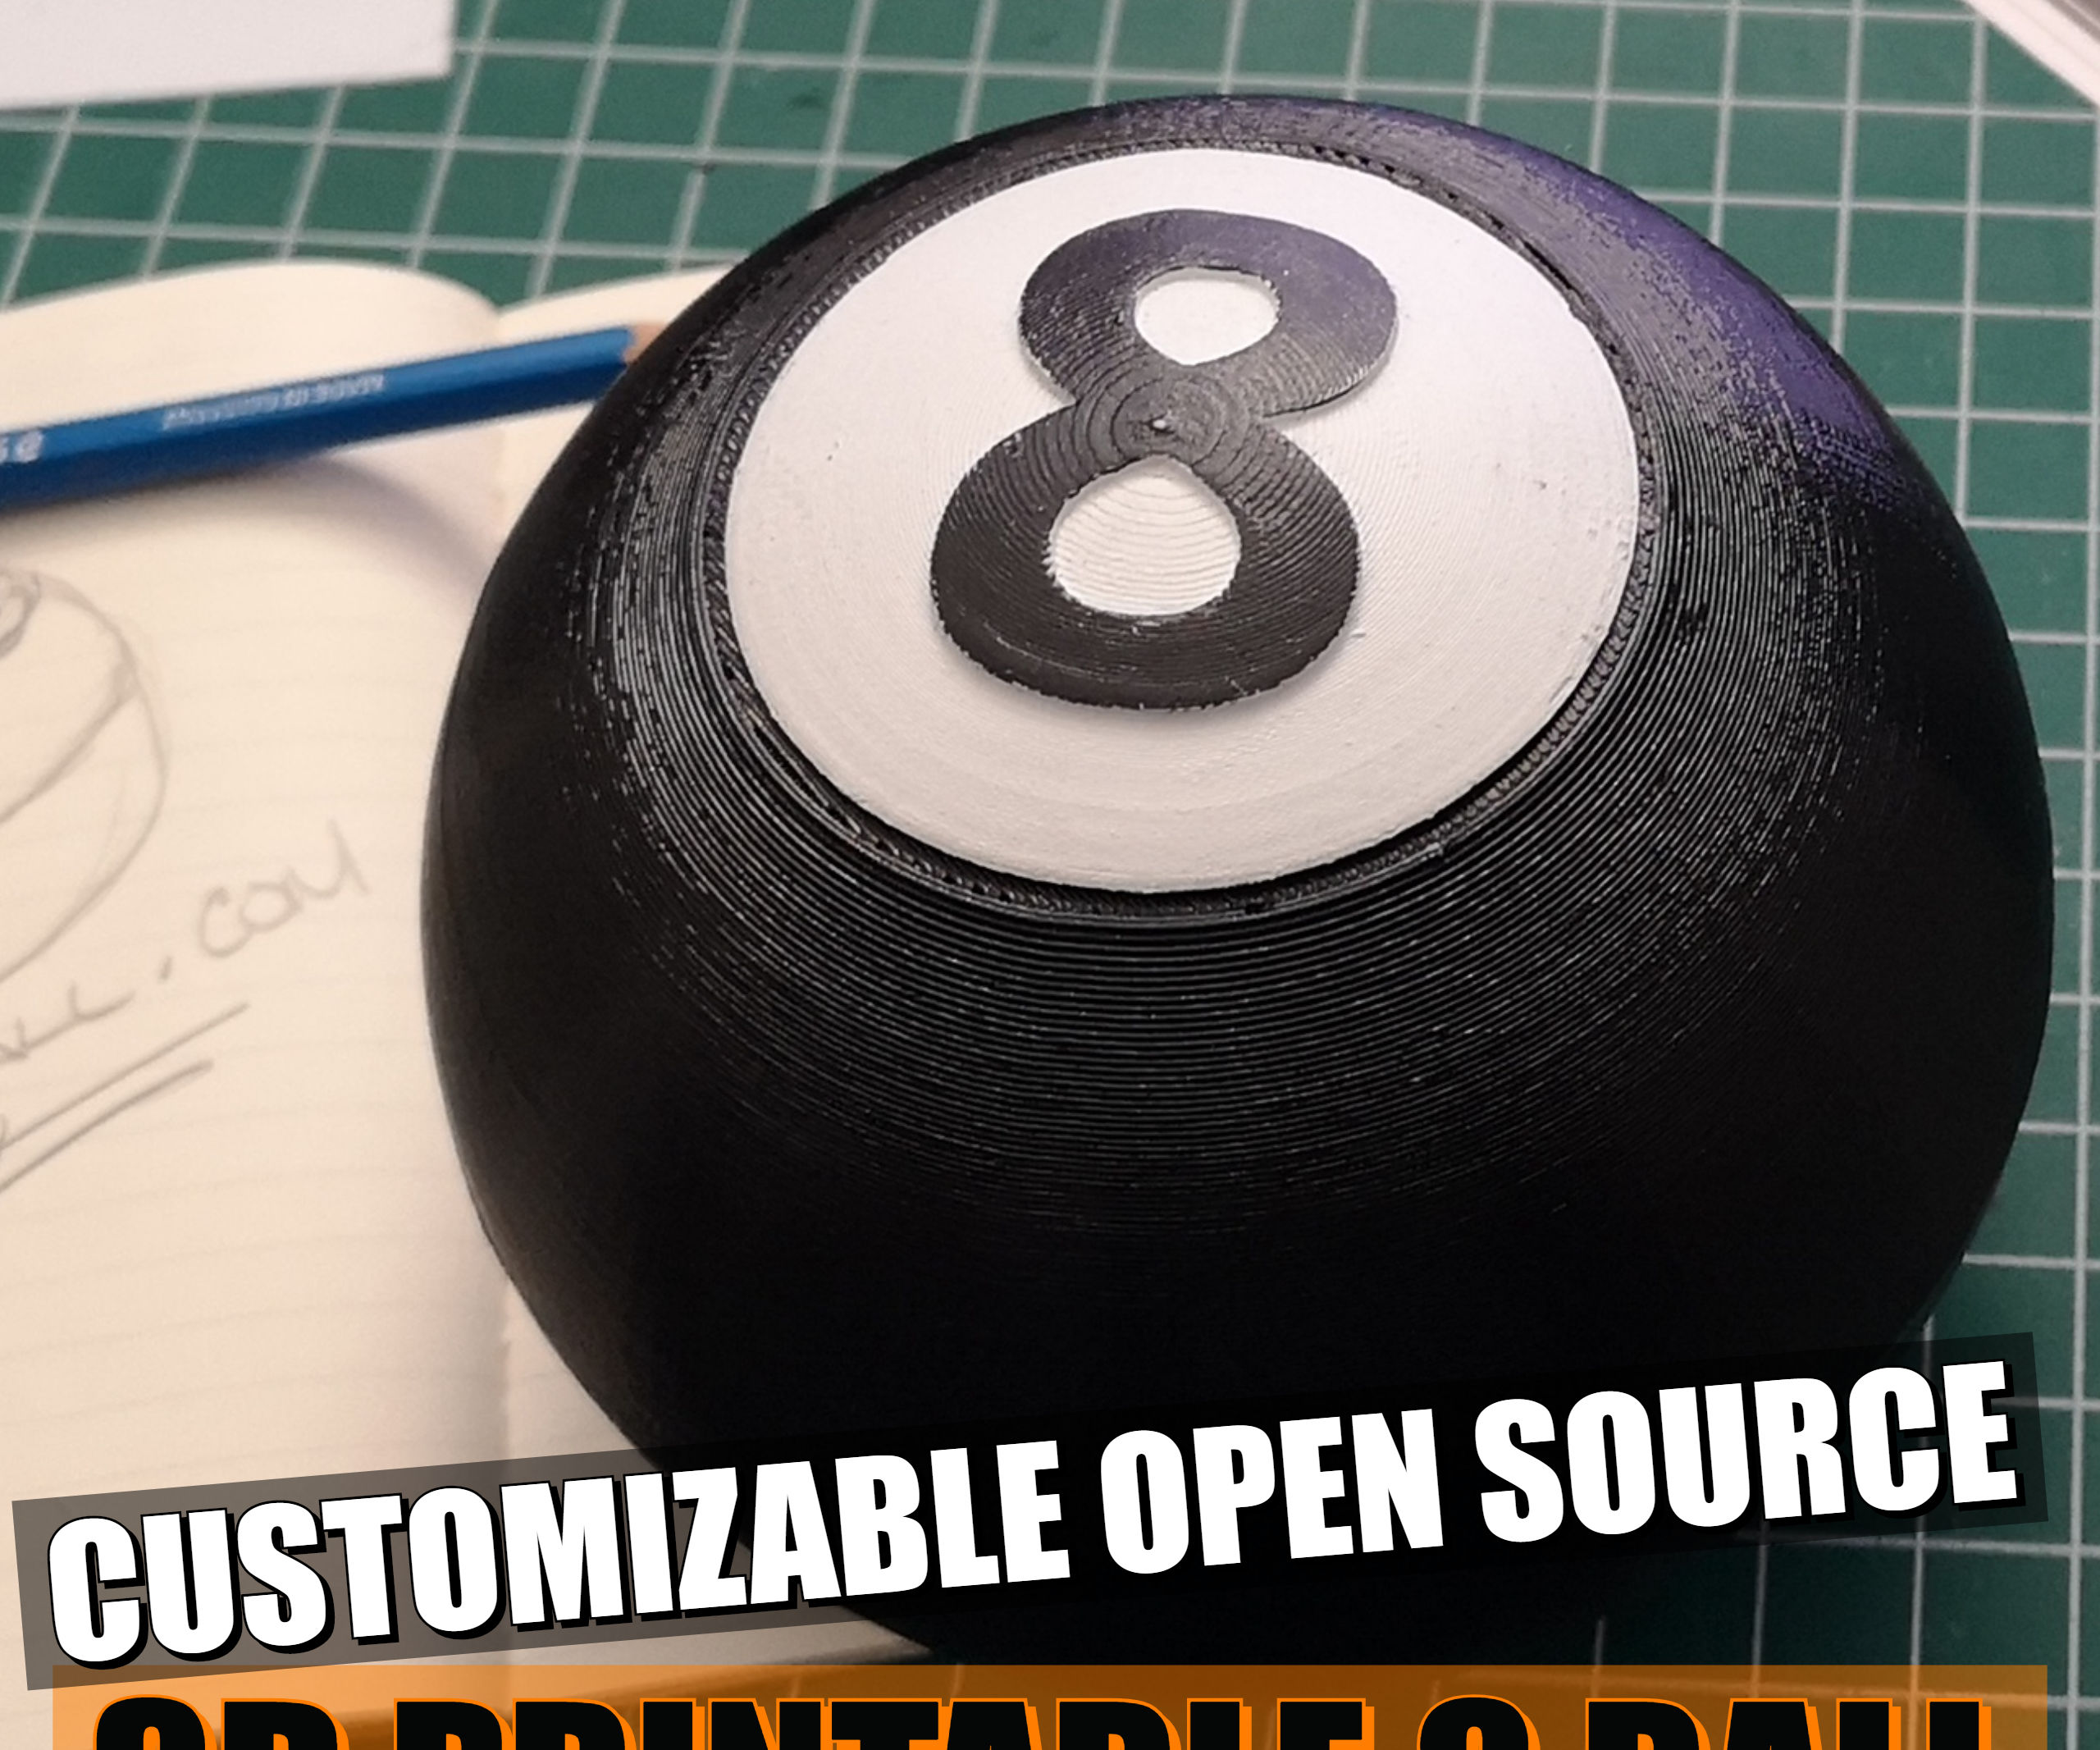 Magic 8 Ball, Open Source, Customizable, Fun and Easy to Build